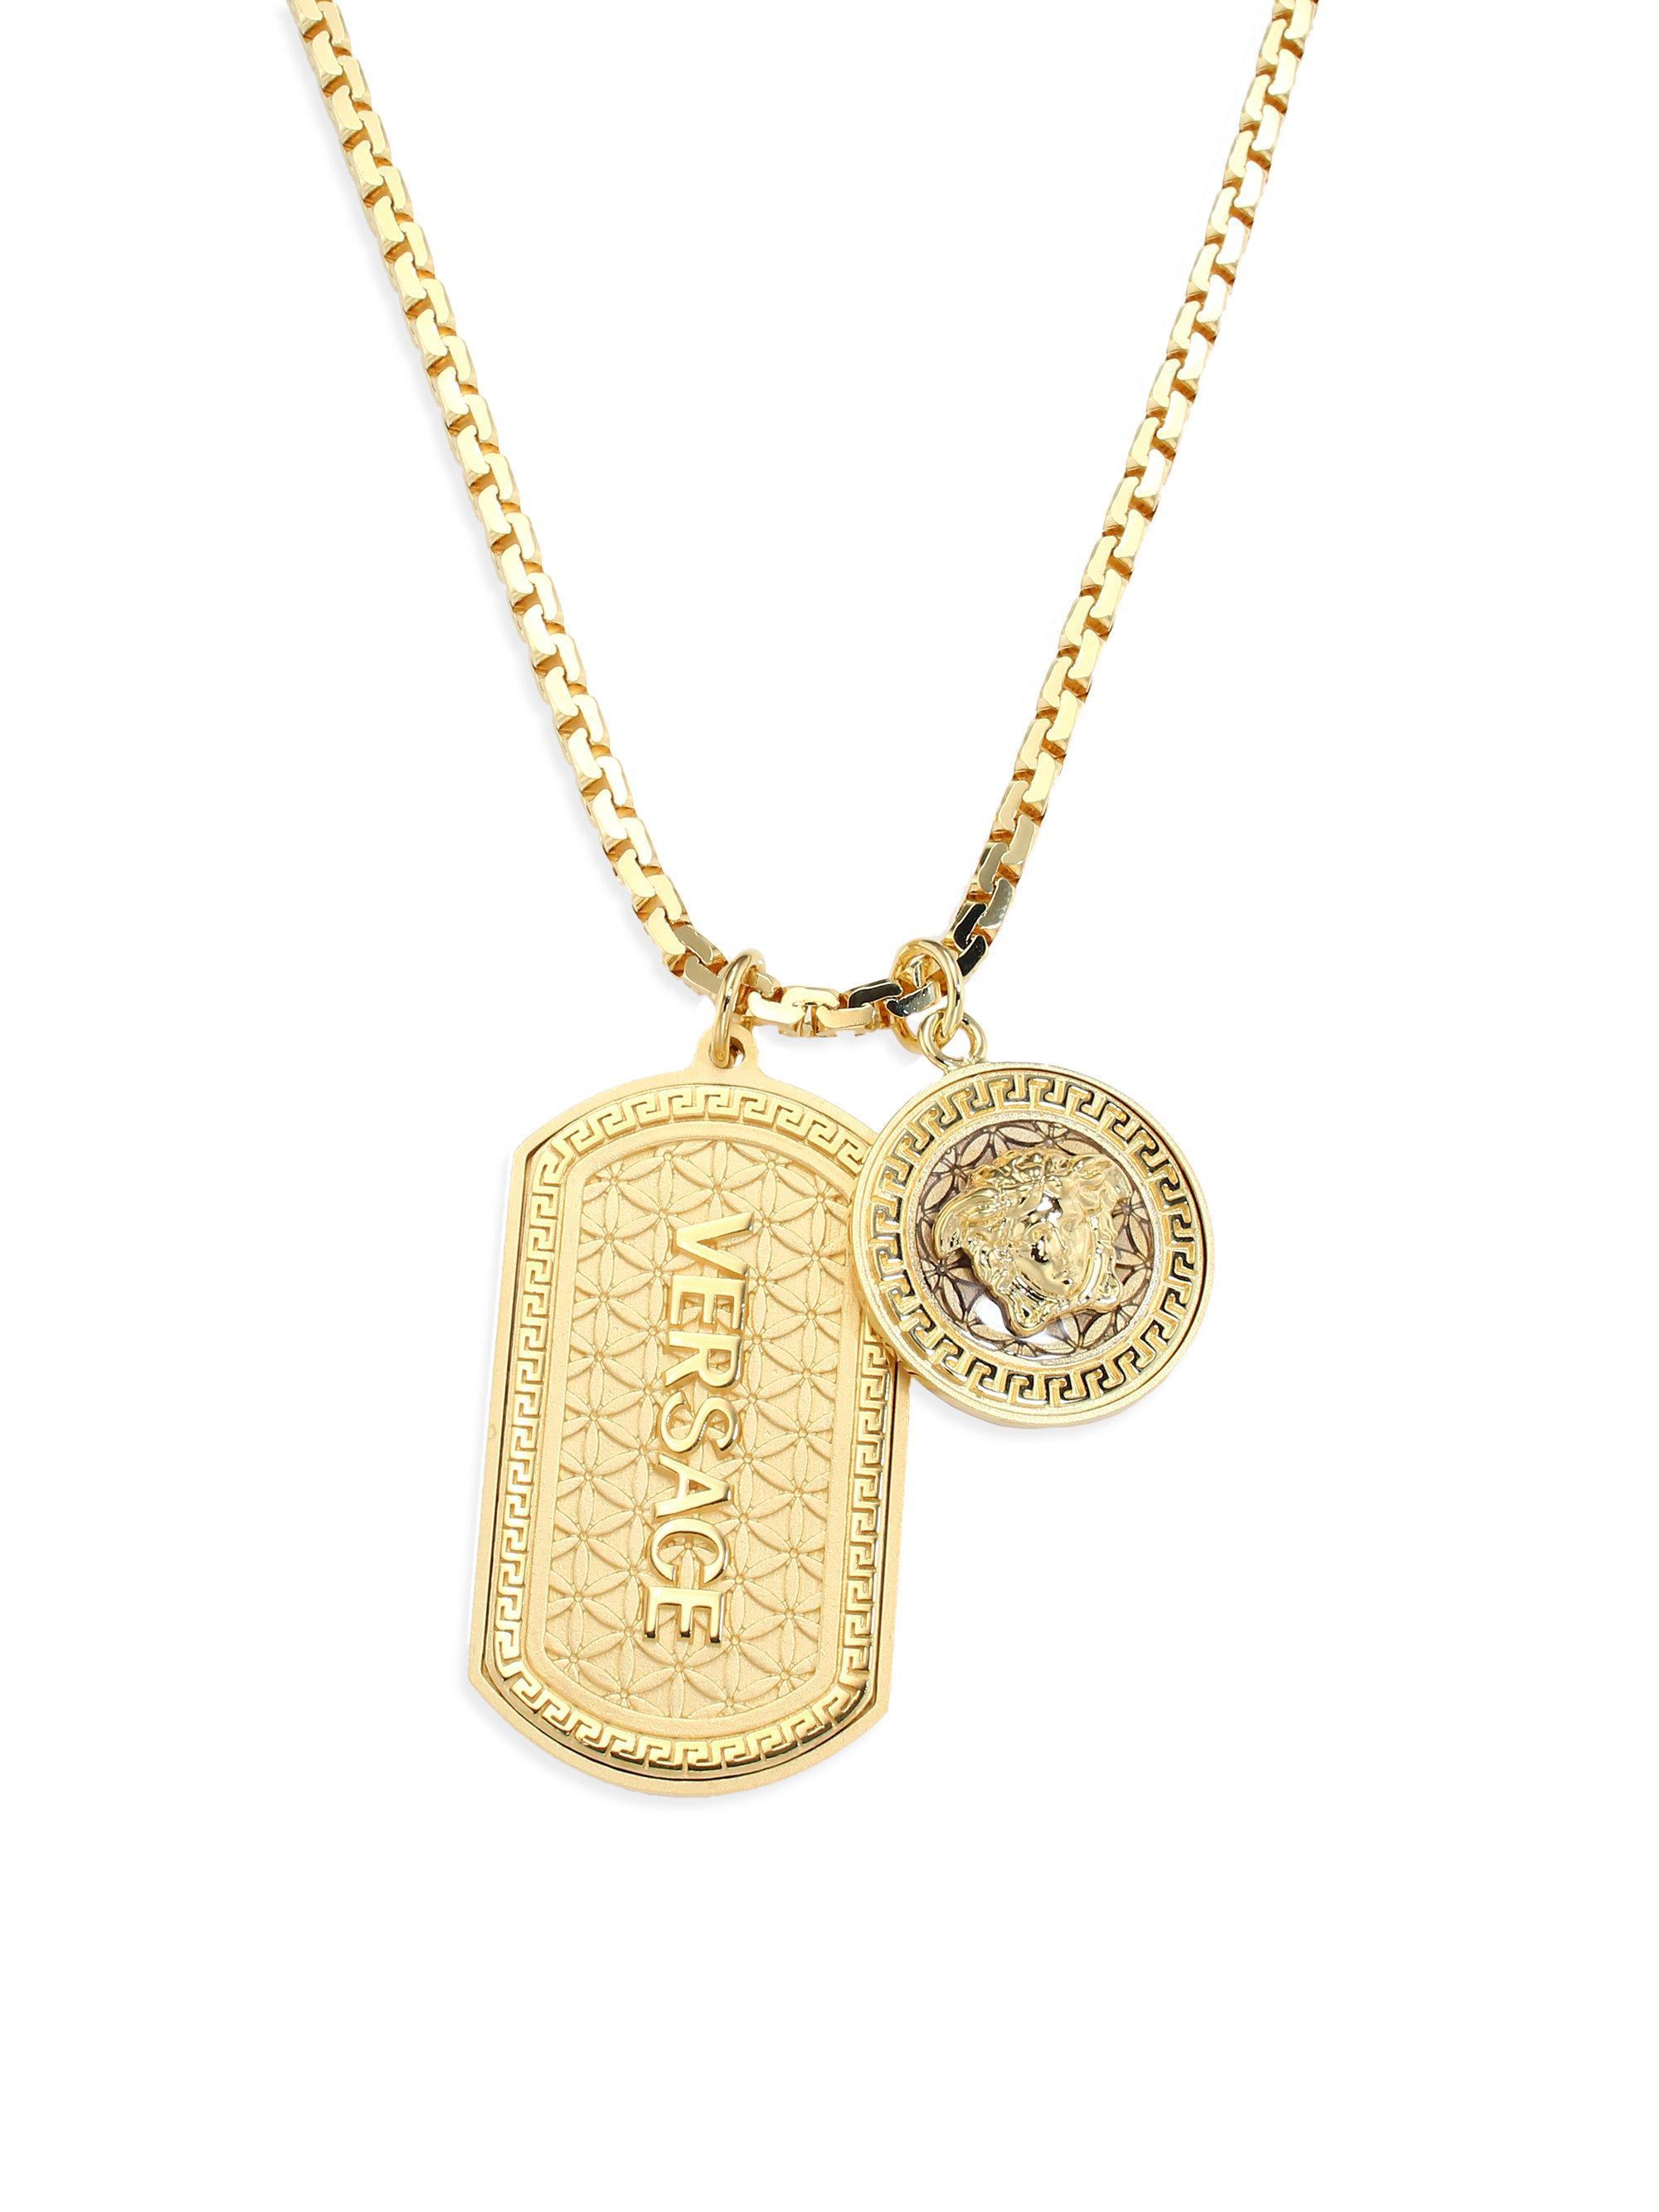 Versace Medusa Dog Tag Necklace - Black Rhod in Metallic for Men - Lyst 384f974ddab